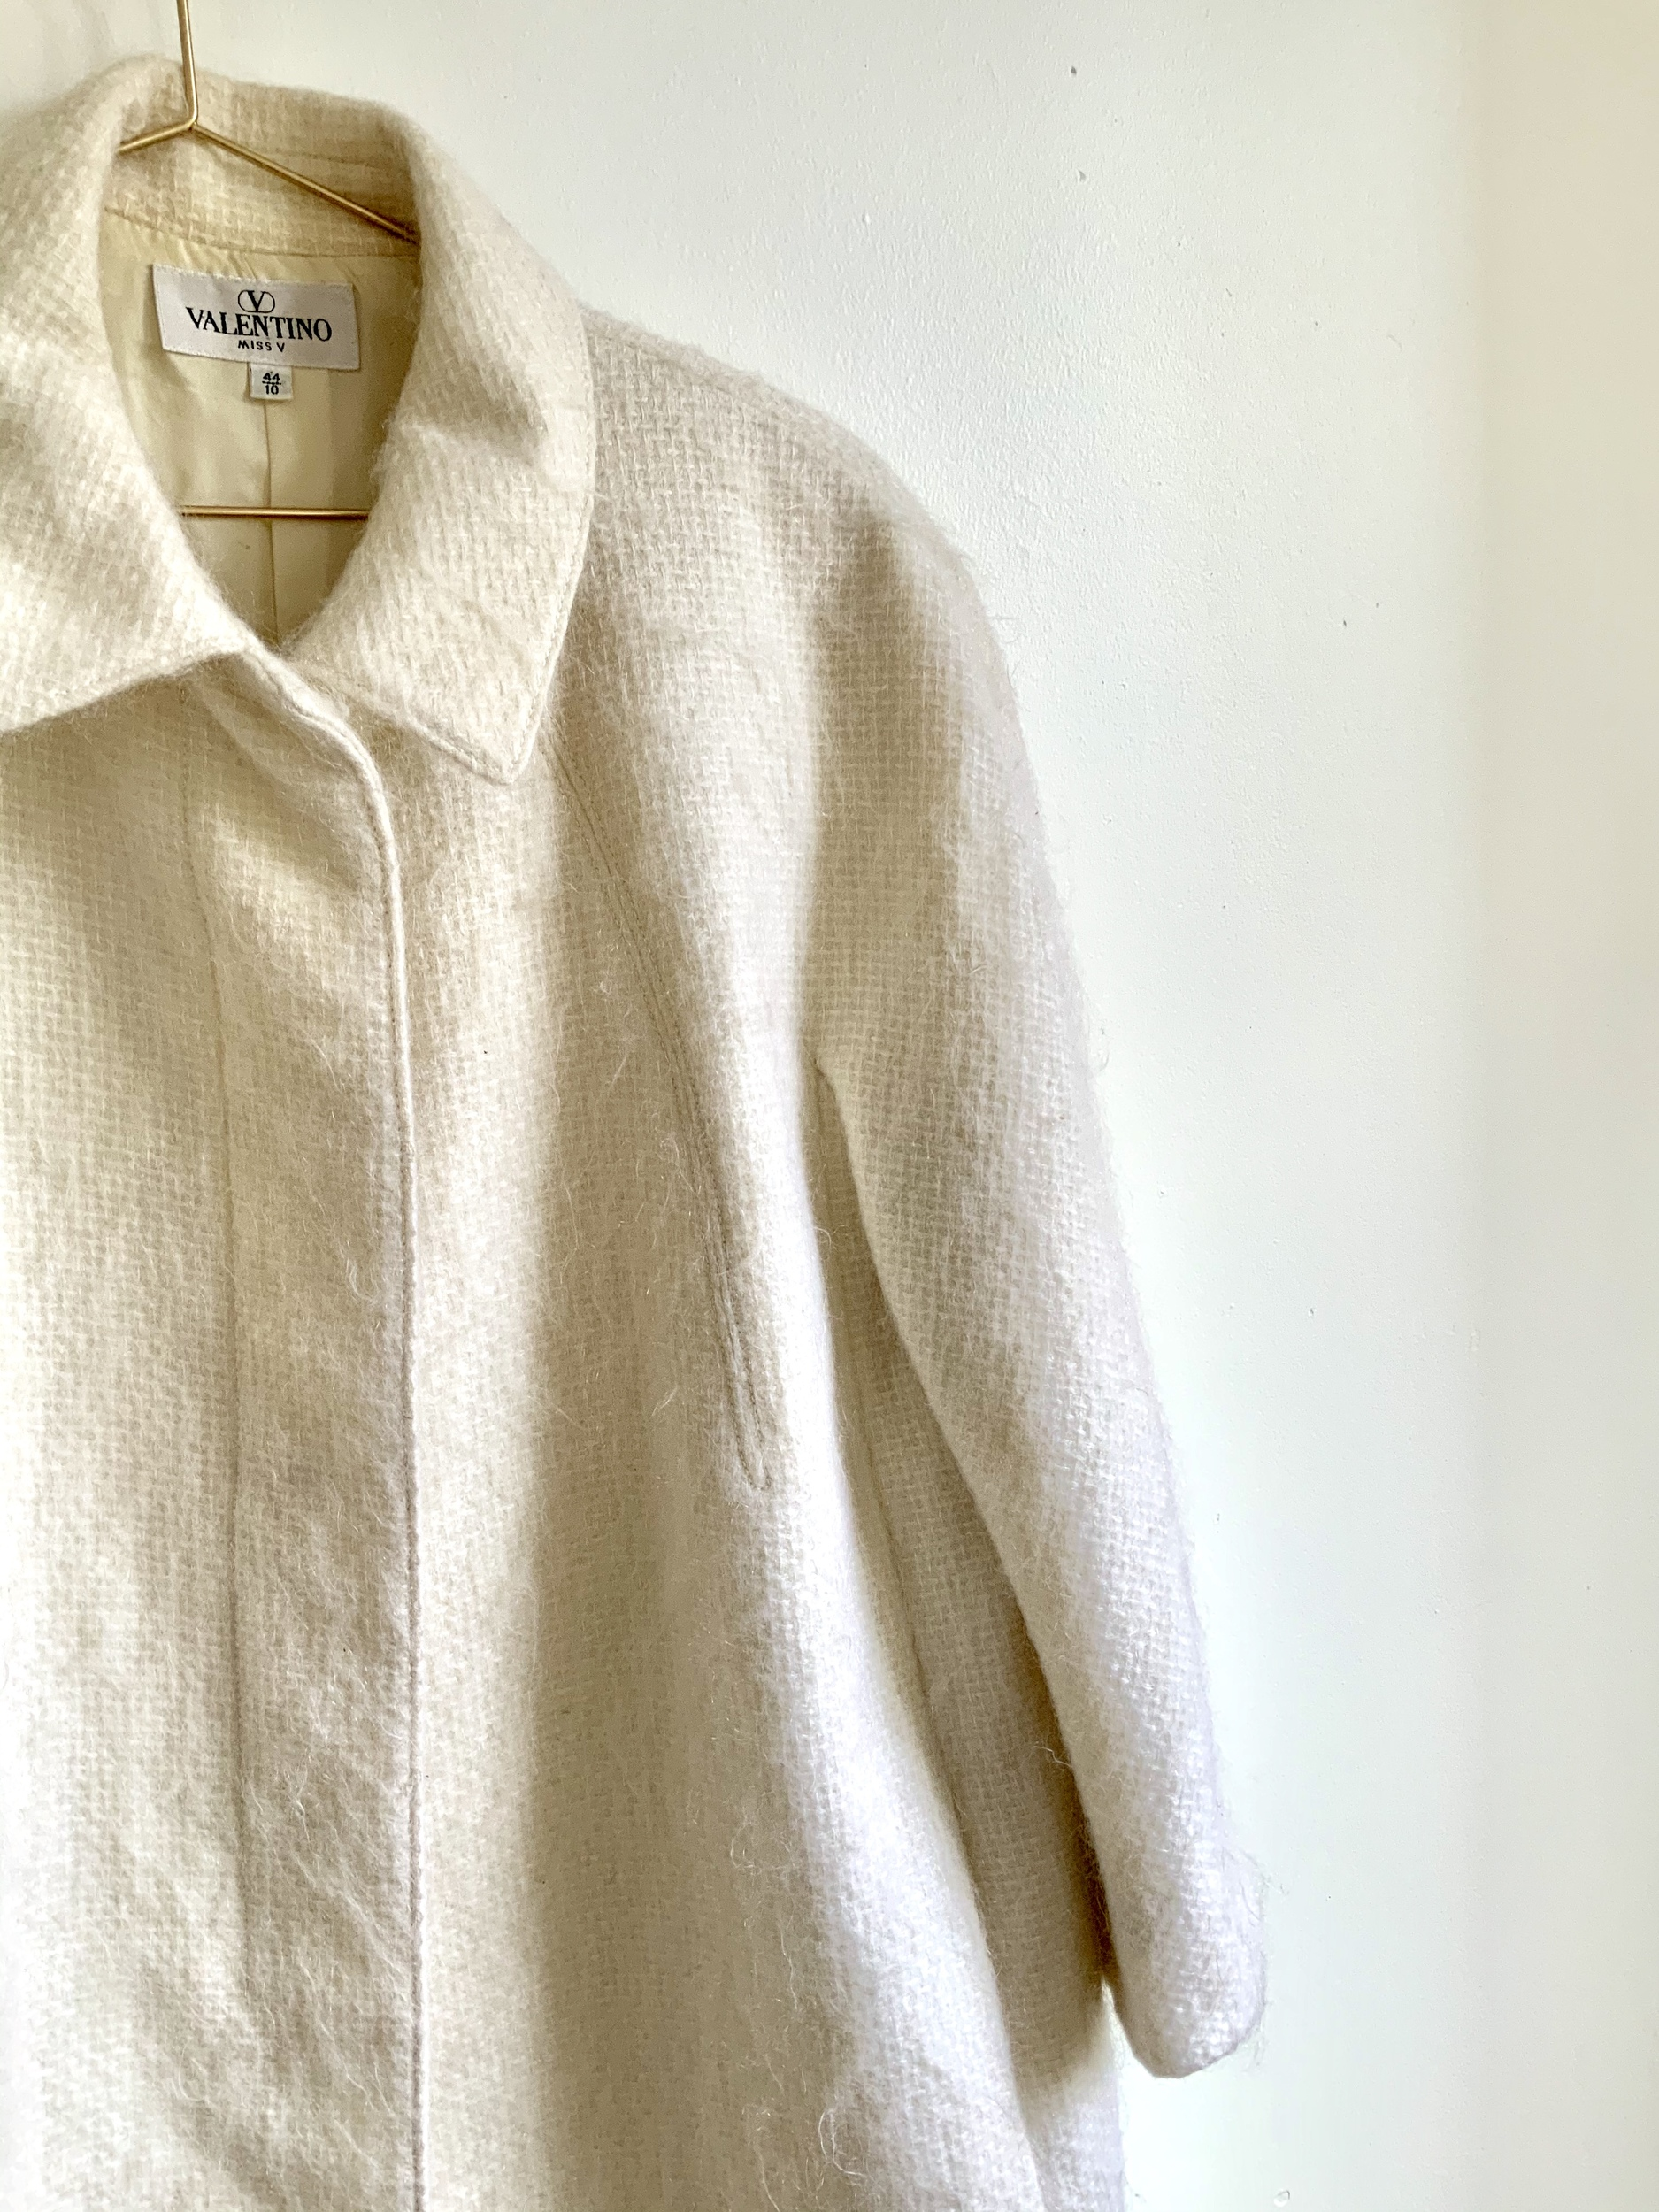 Manteau Valentino